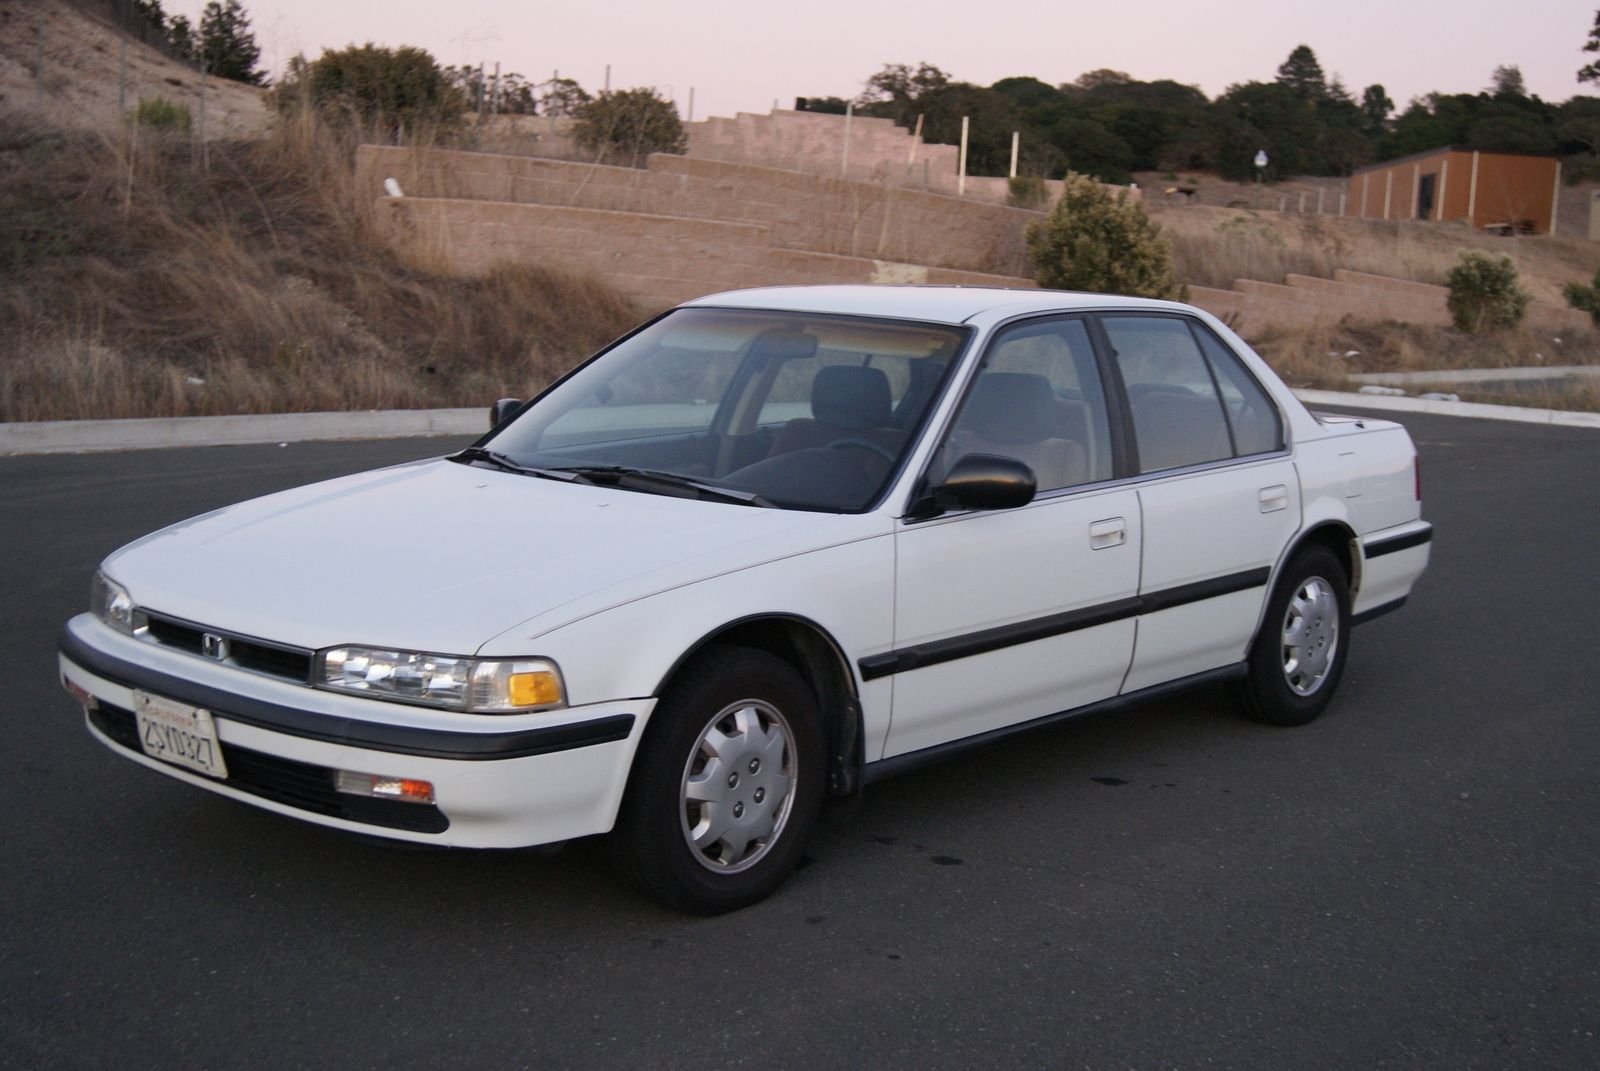 1990 Honda Accord LX Honda accord, Honda accord lx, Honda